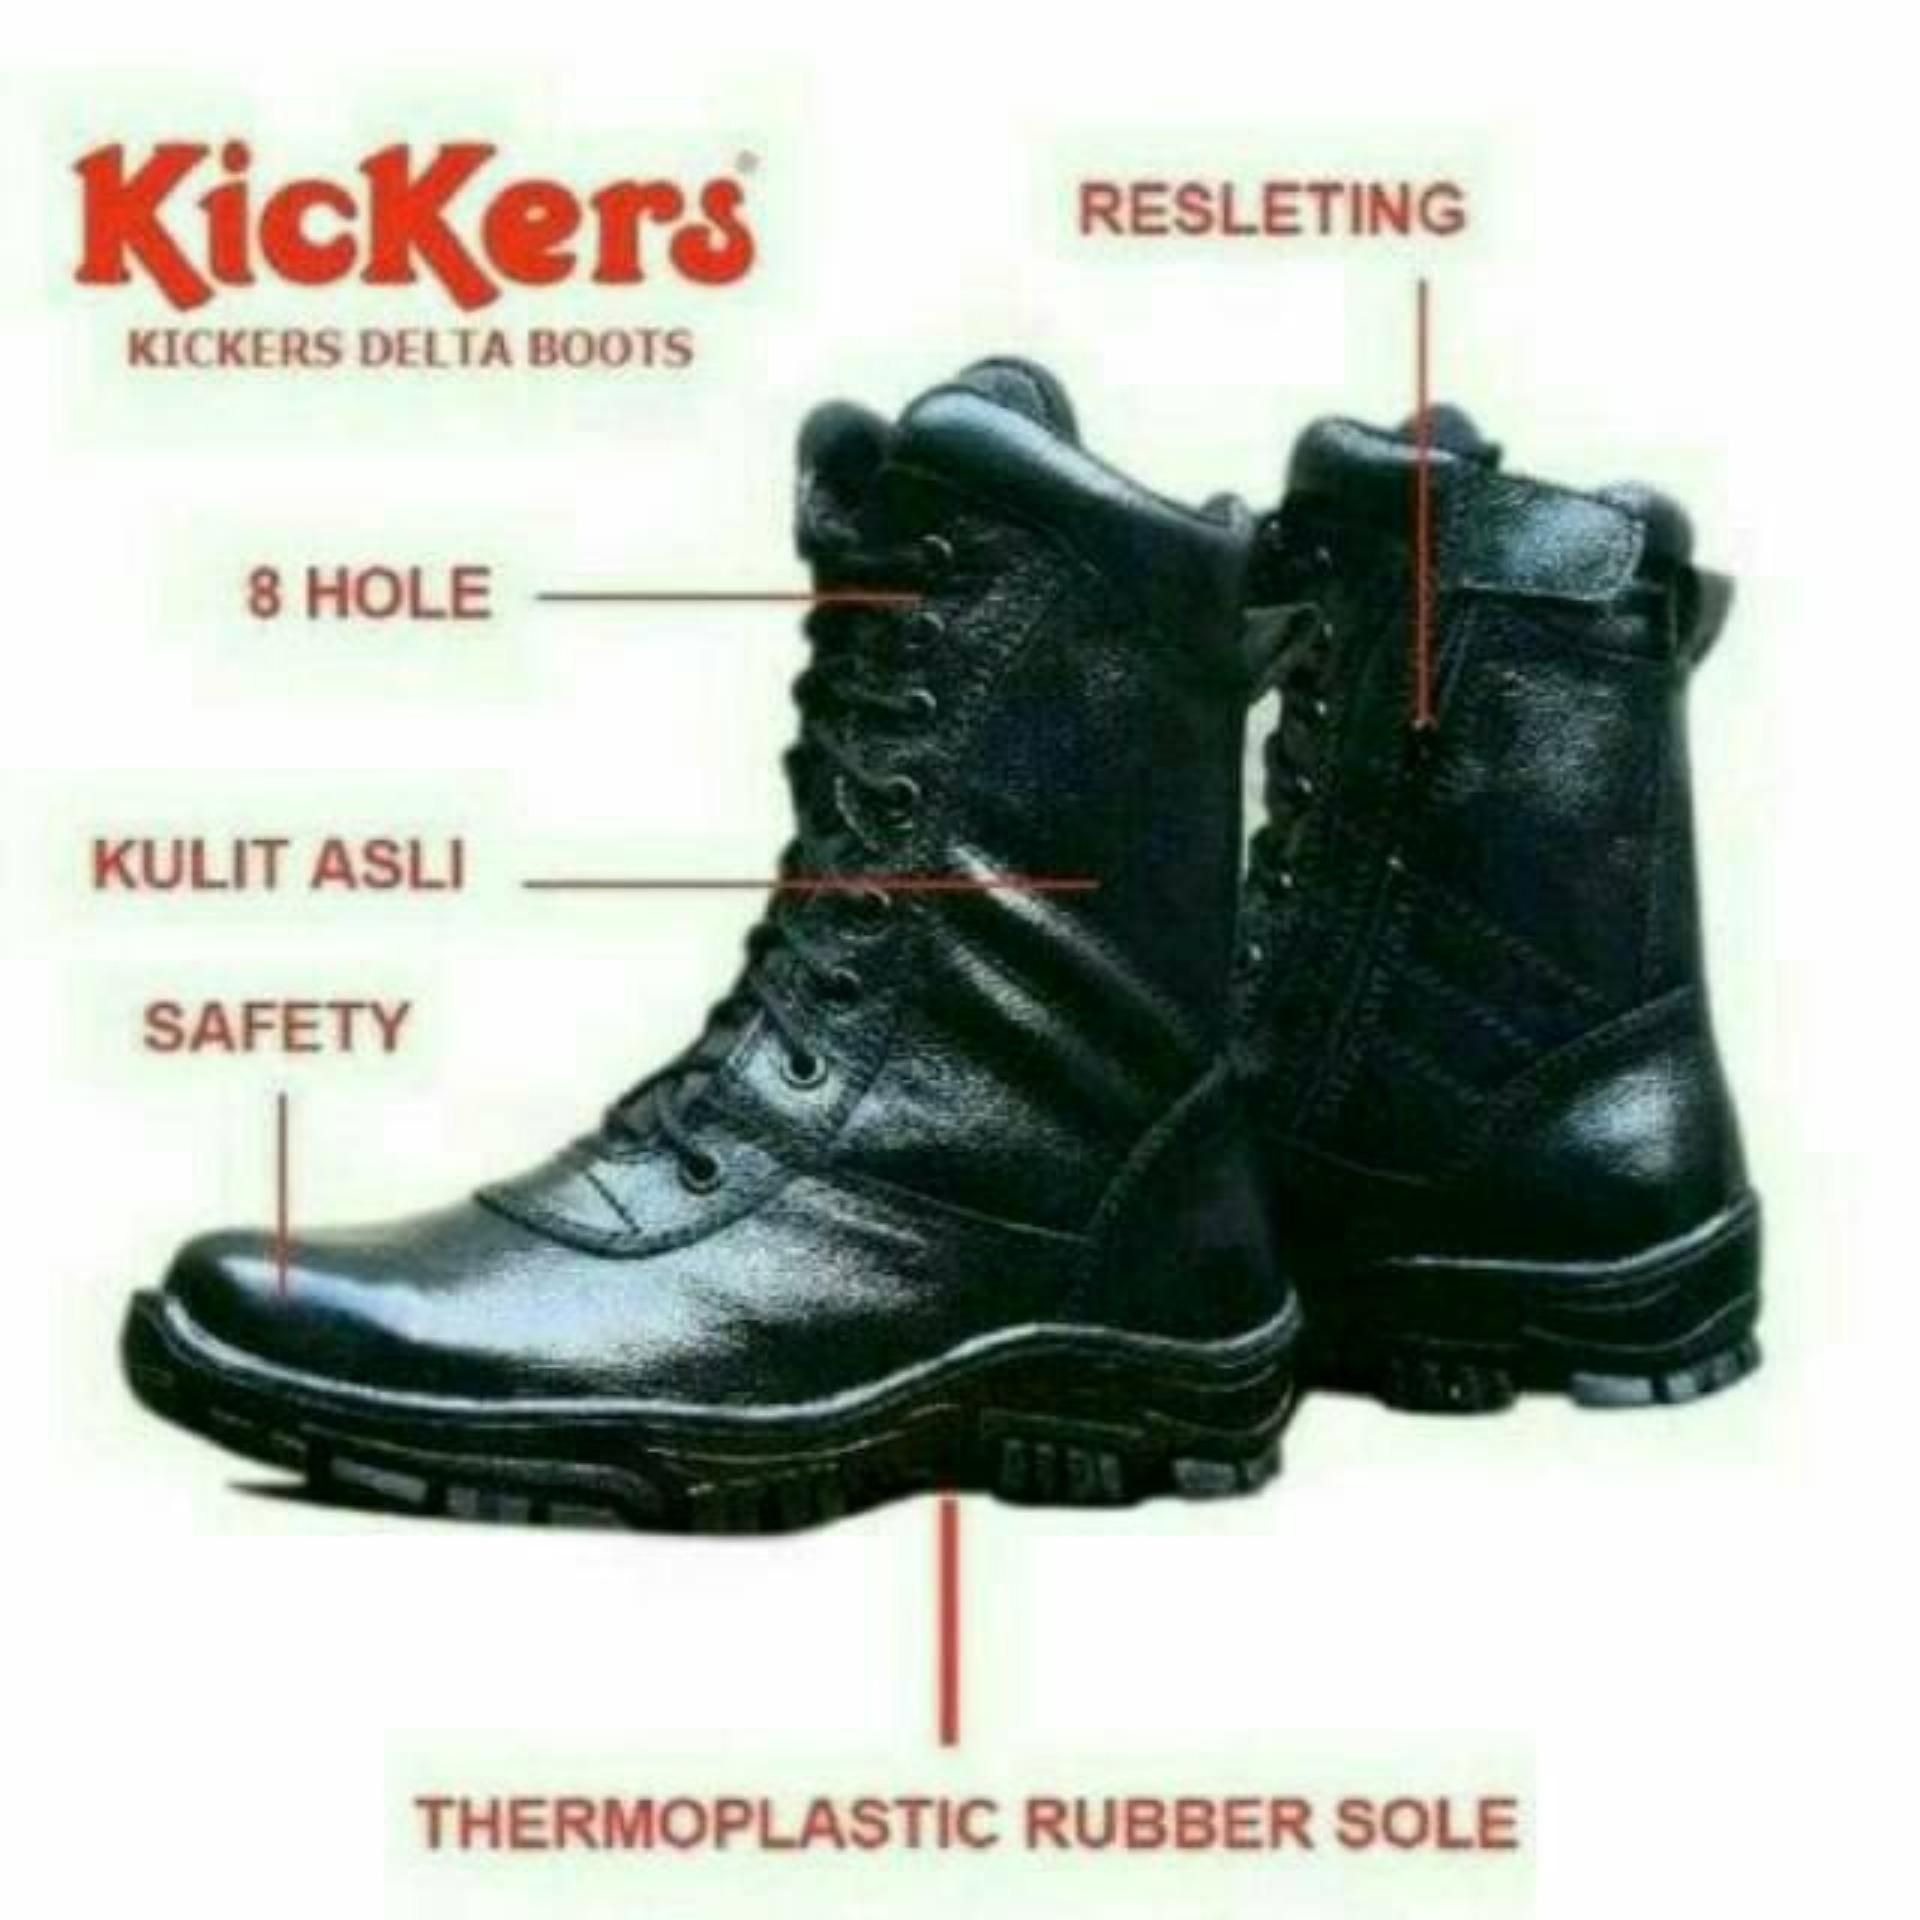 Kickers Sepatu Boots Pria Keren Sepatu Kickers Safety Kulit Sepatu ... 3dd3d700e2